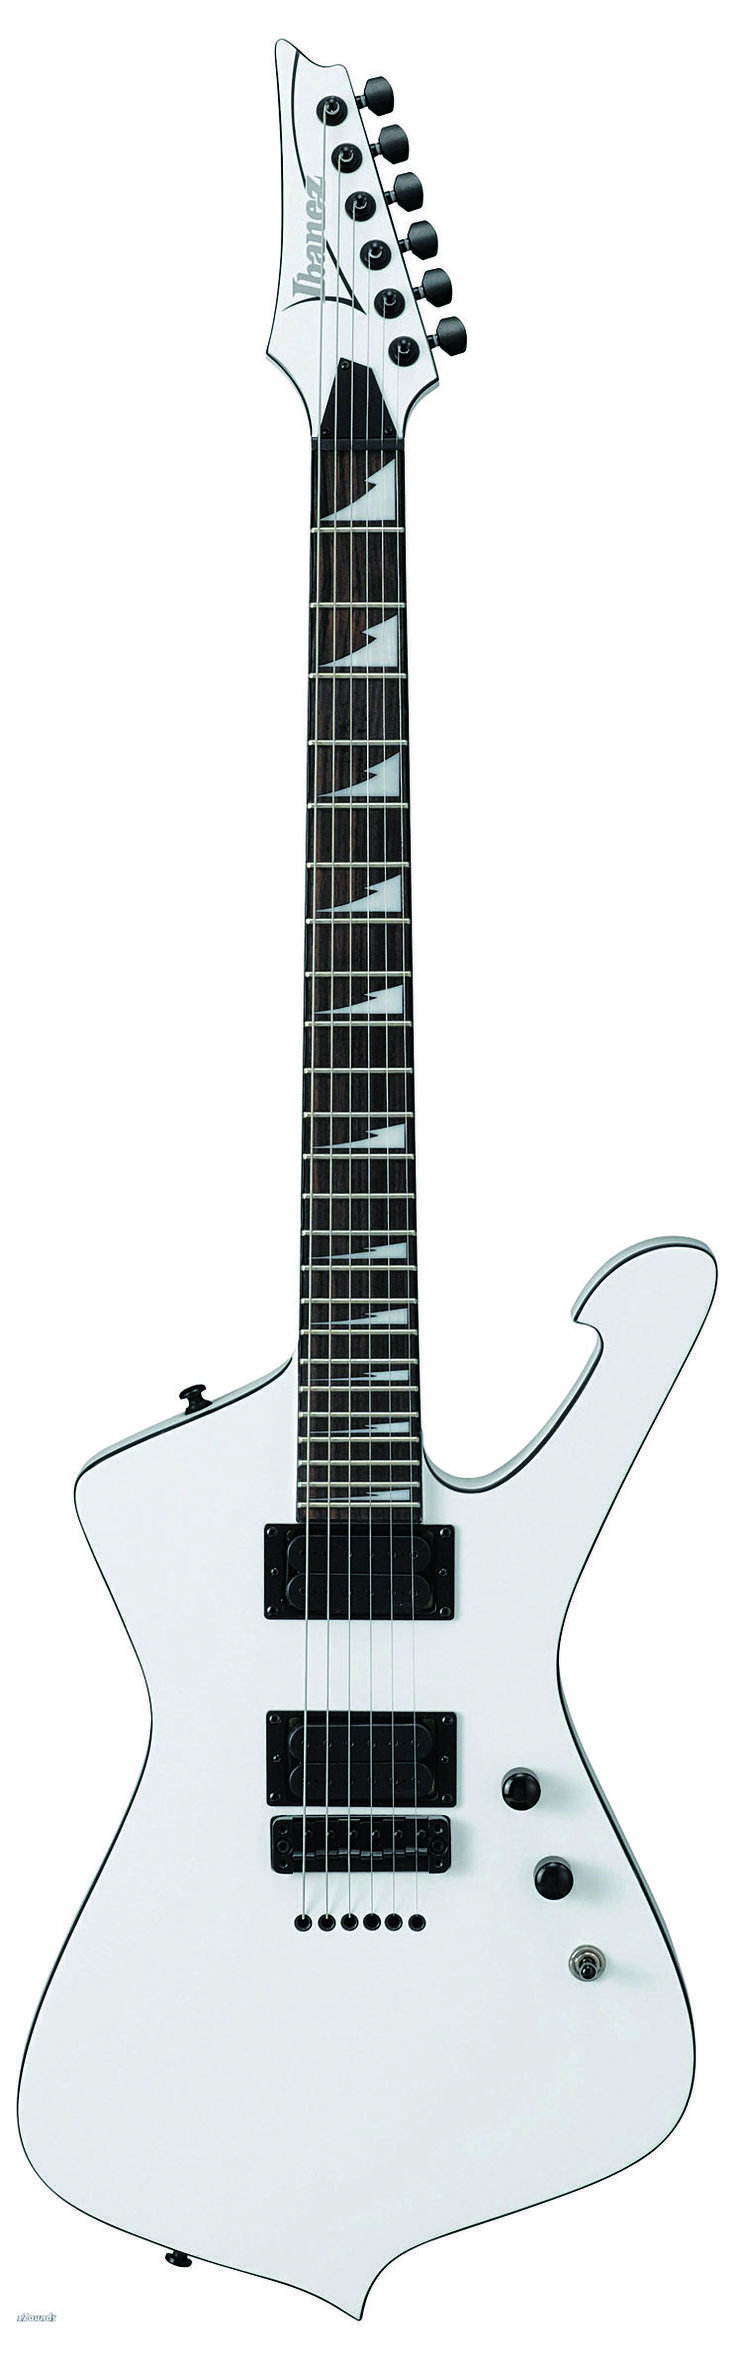 İbanez iceman electric guitar